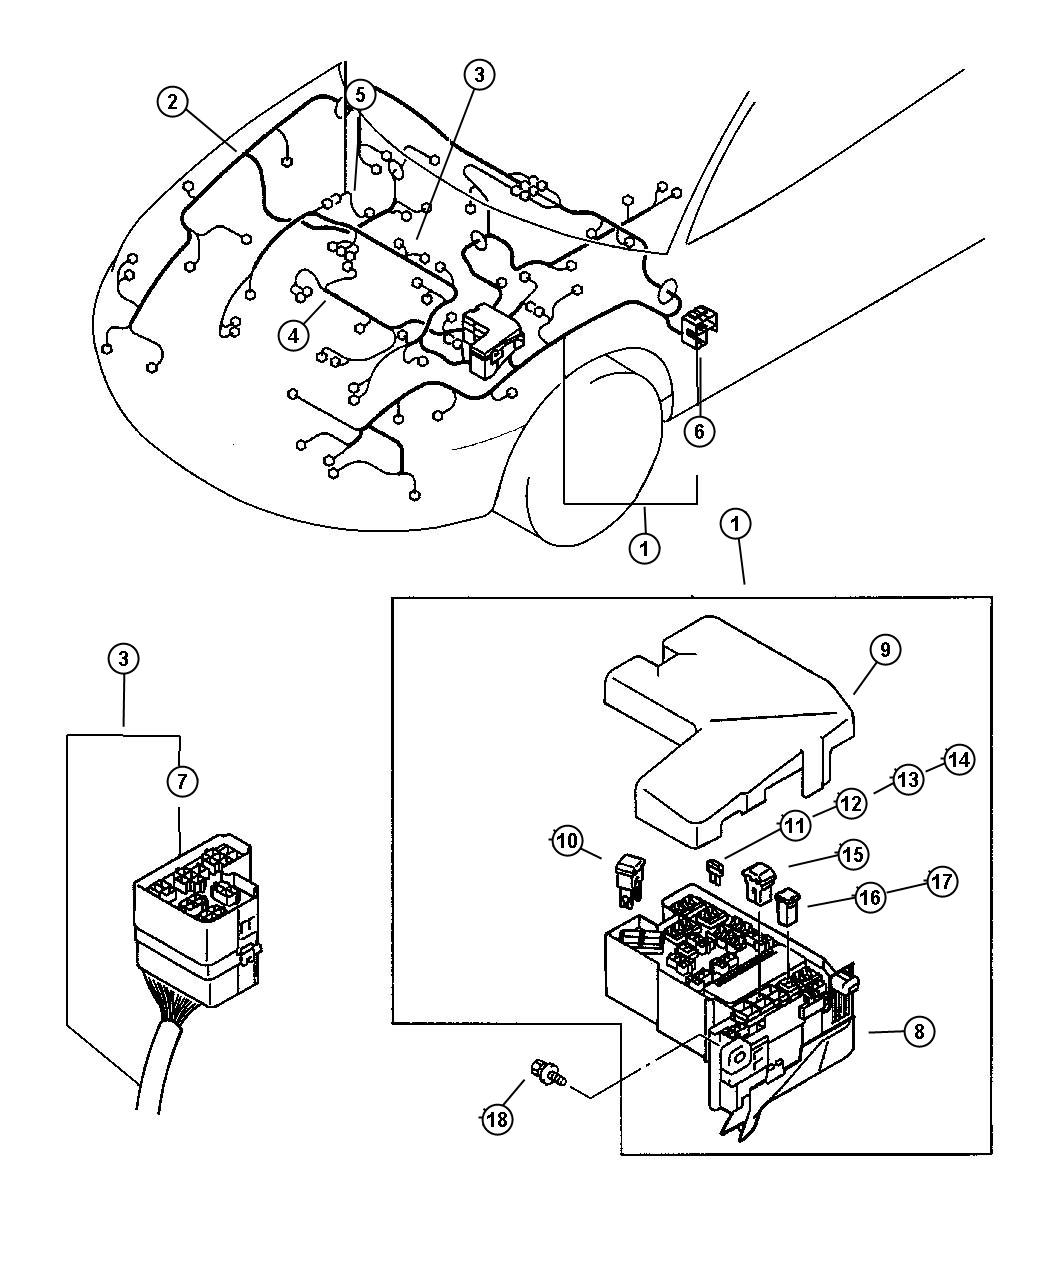 32 Chrysler Sebring Fuse Box Diagram